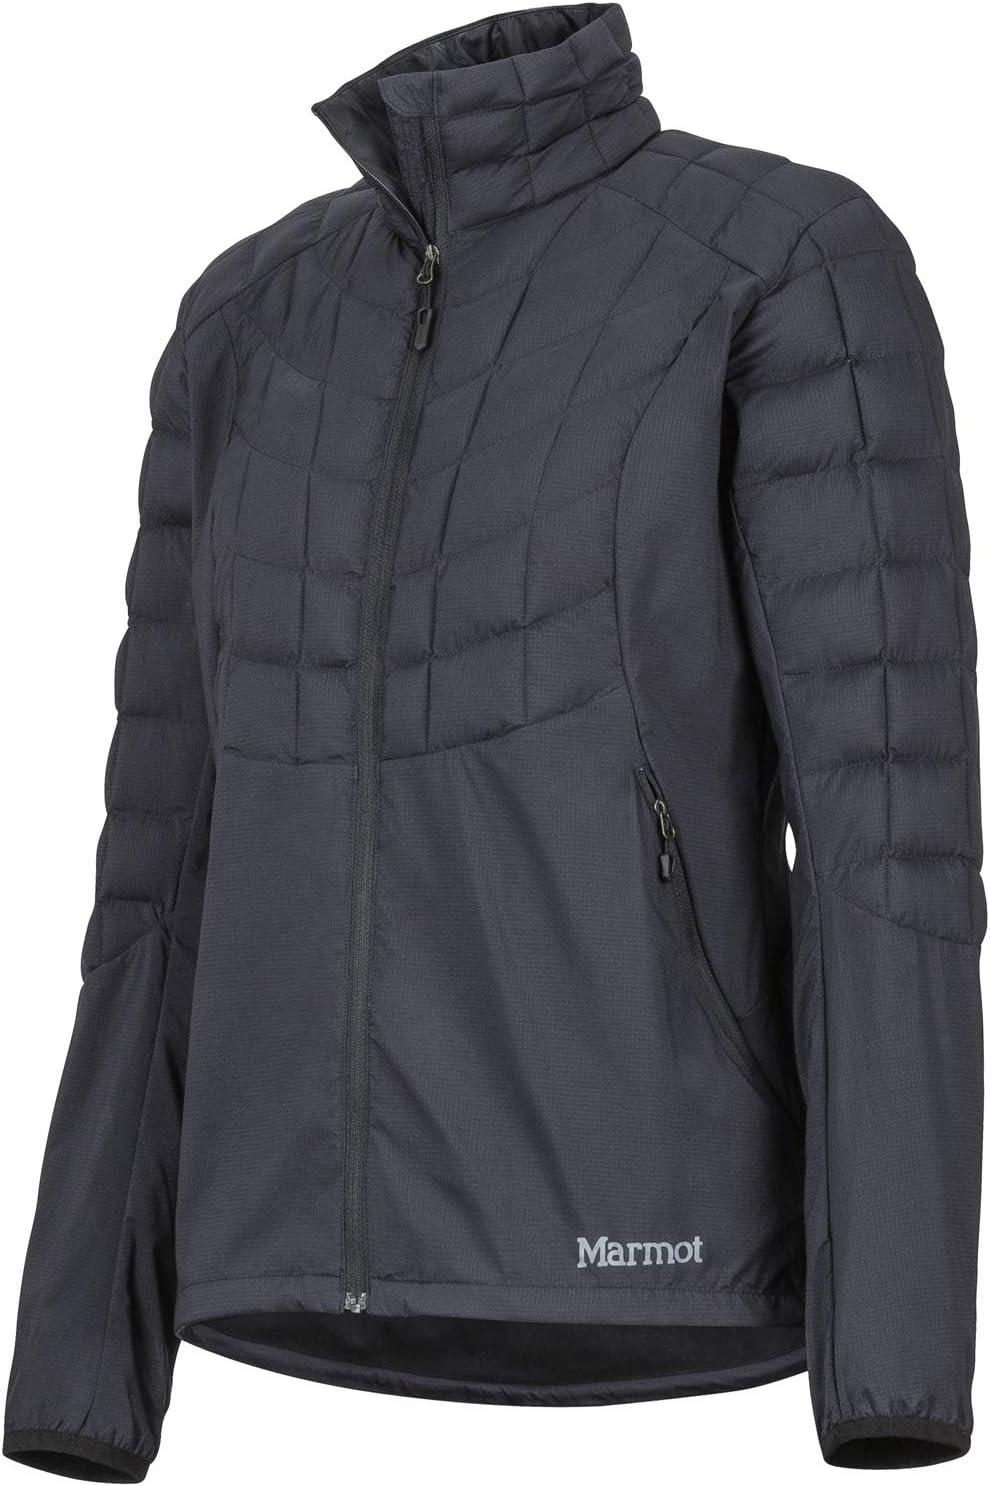 Veste de randonn/ée Coupe-Vent Marmot Wms Featherless Hybrid Jacket Softshell Isolante Anorak Femme